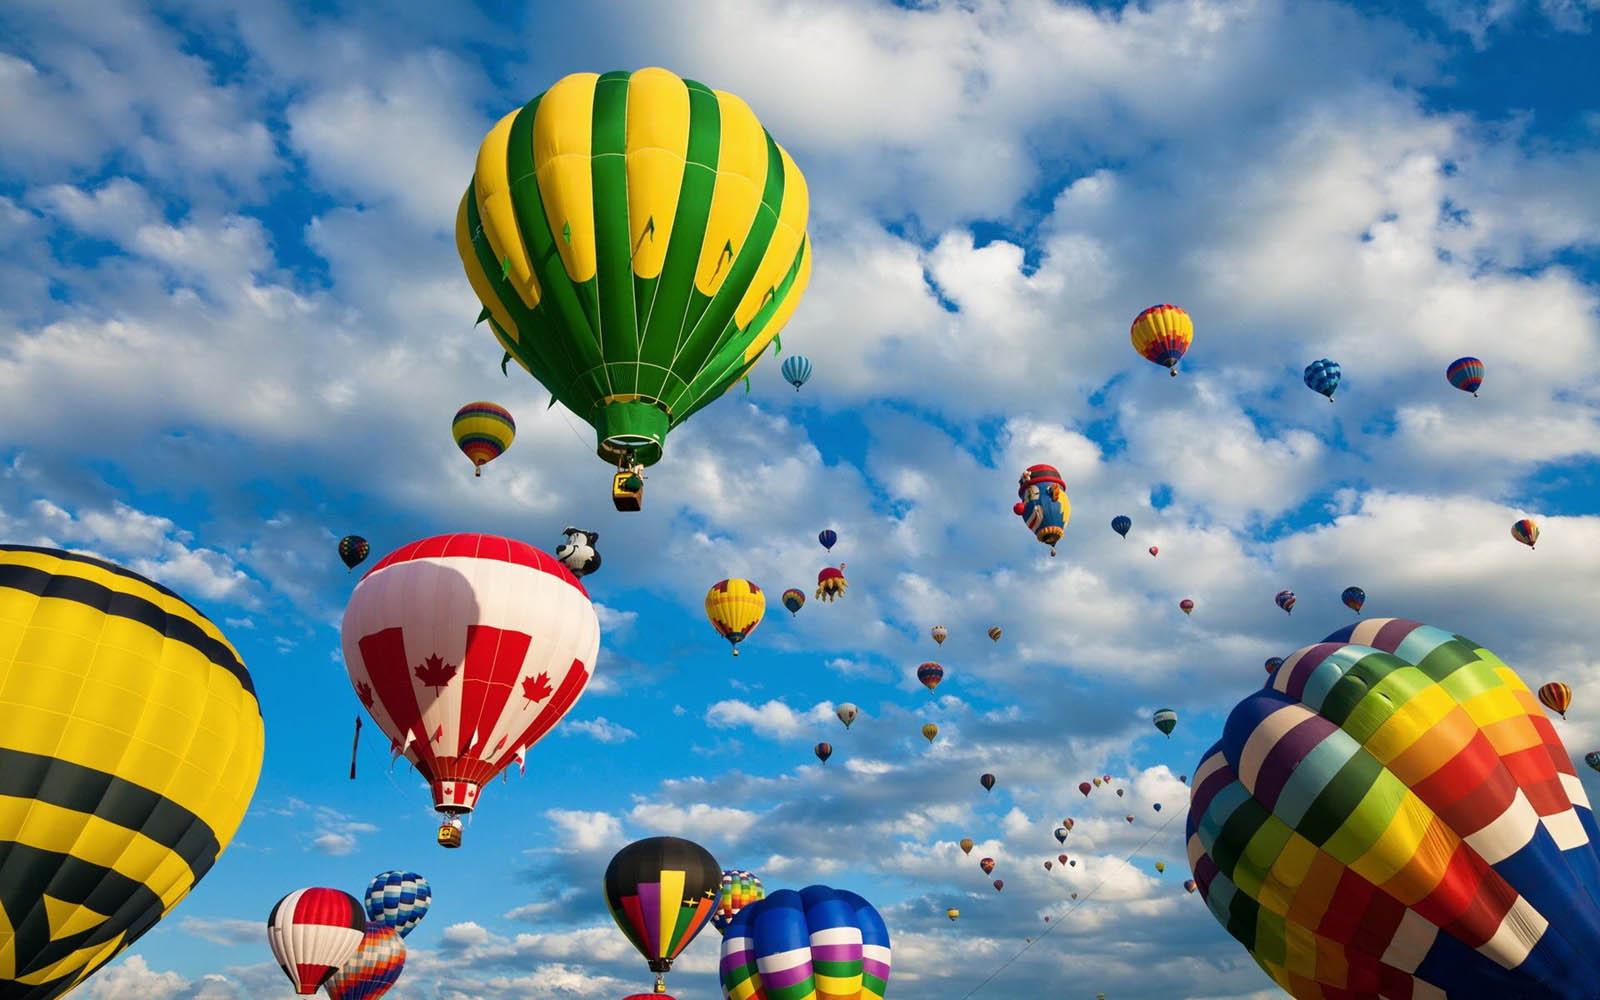 Love Wallpaper Gambar Gambar Balon Udara Yang Cantik